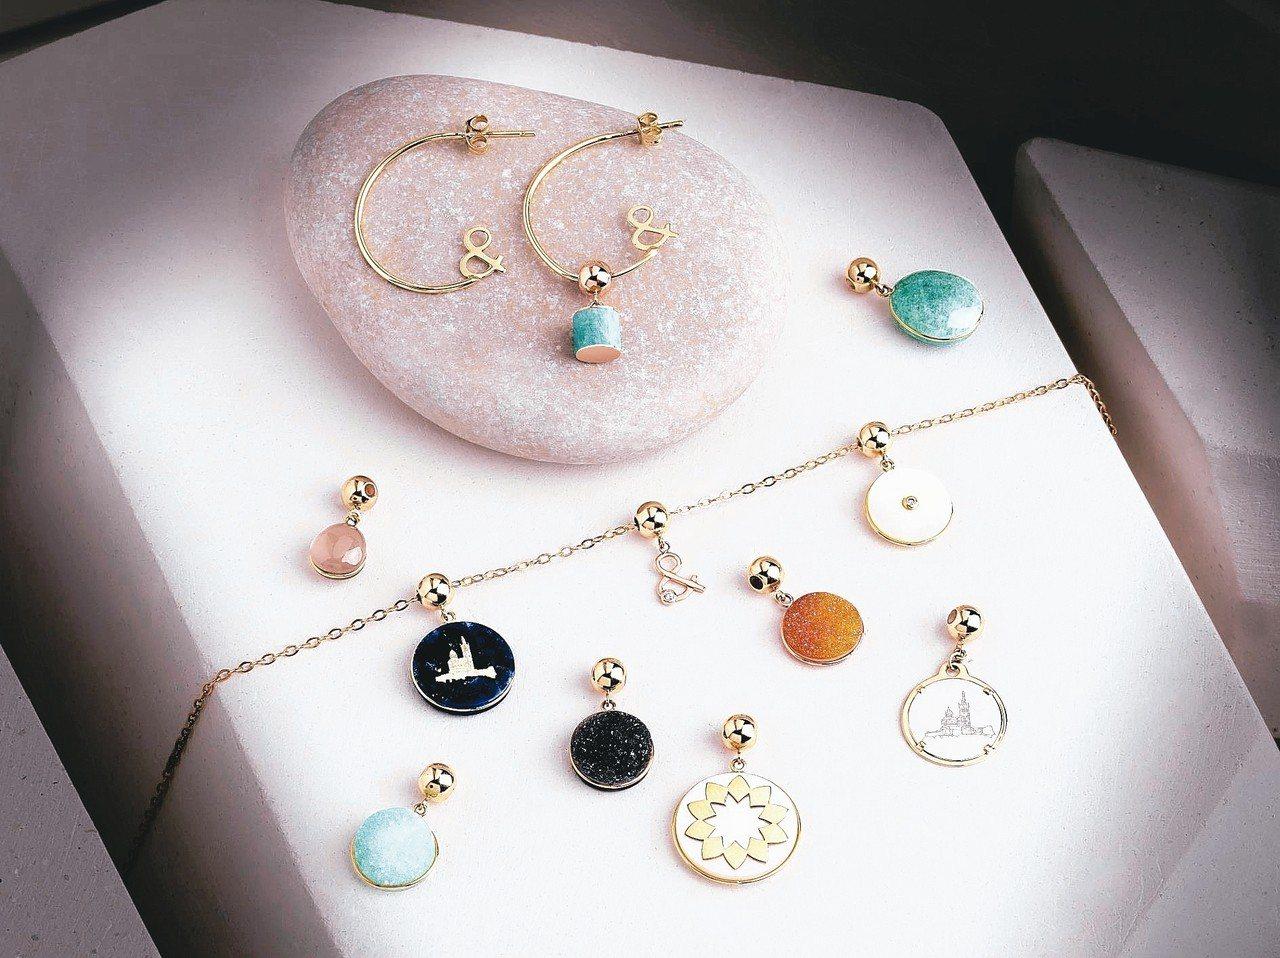 min&ral不僅是普羅旺斯的百年珠寶品牌,還是世界上最古的幸運符概念的珠寶品牌...